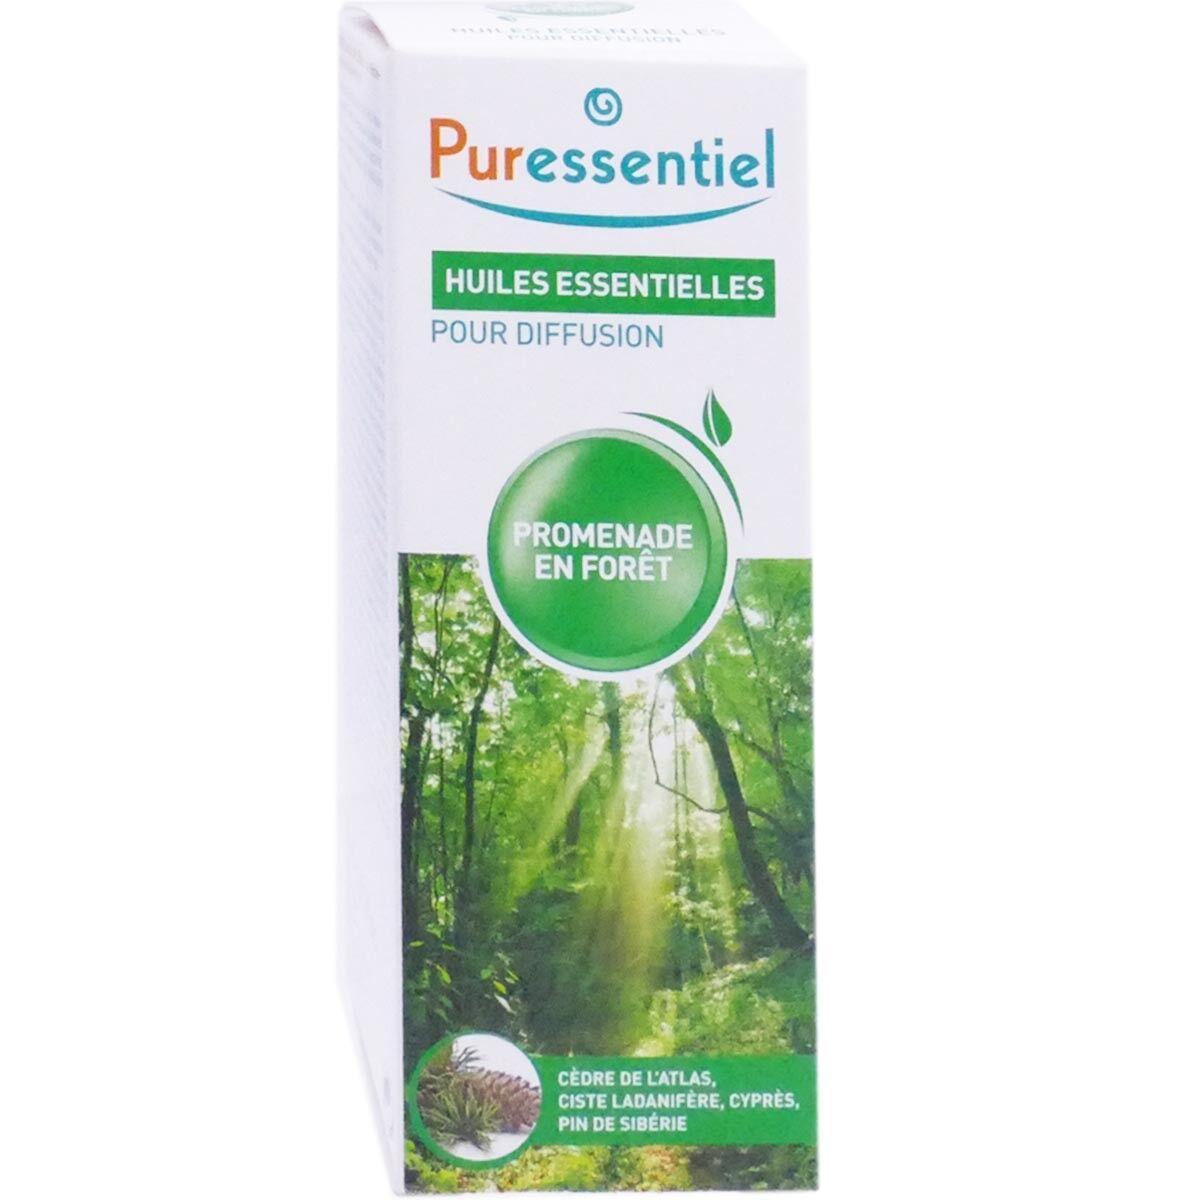 Puressentiel huile essentielle pour diffusion promenade en foret 30ml